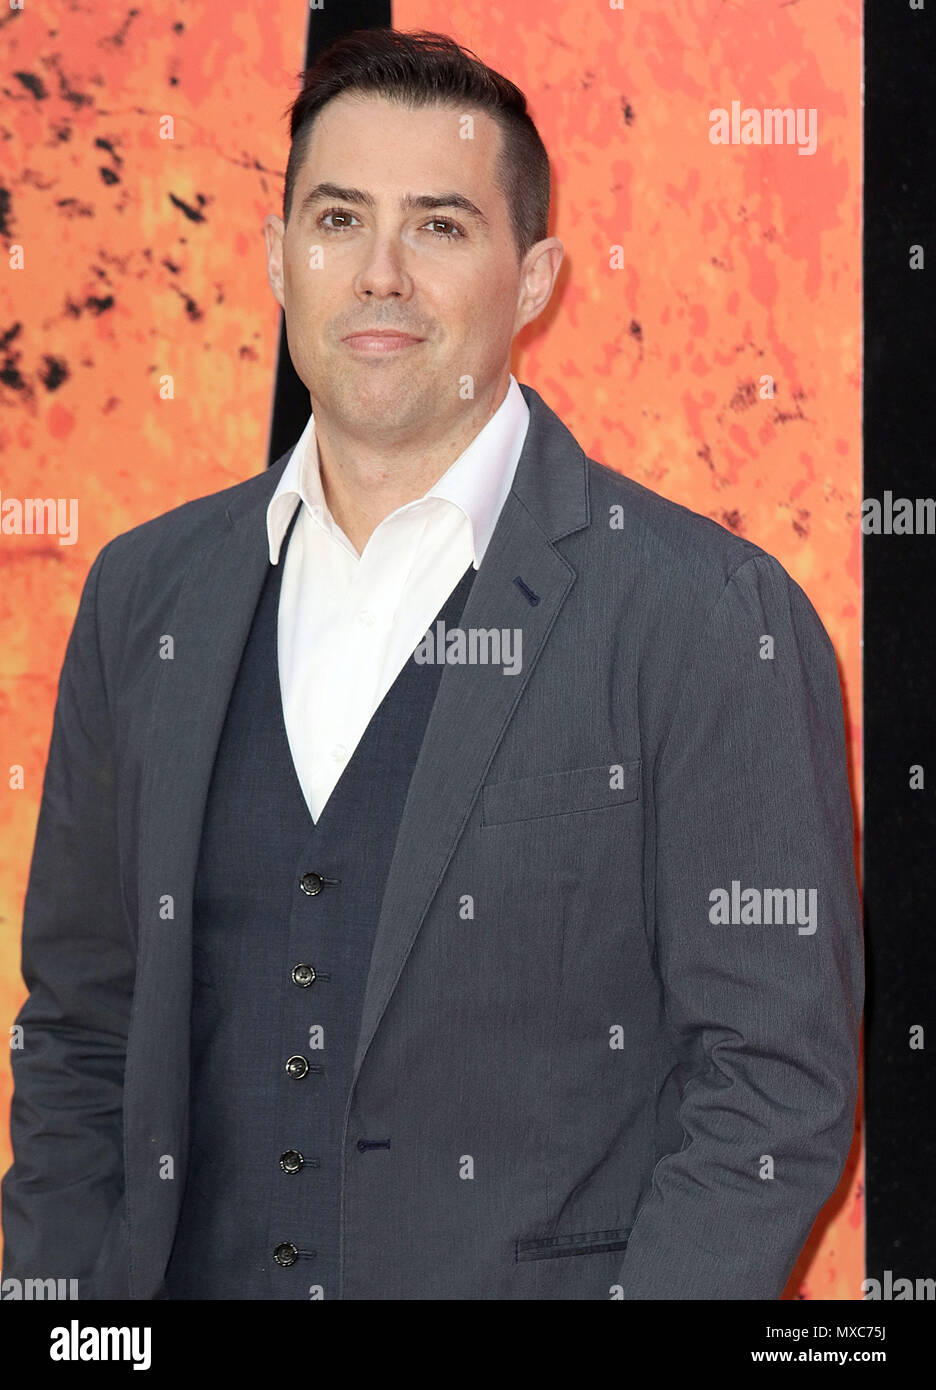 April 11, 2018 - Brad Peyton Teilnahme an 'Rampage Europäische Premiere, Cineworld Leicester Square in London, England, Großbritannien Stockbild